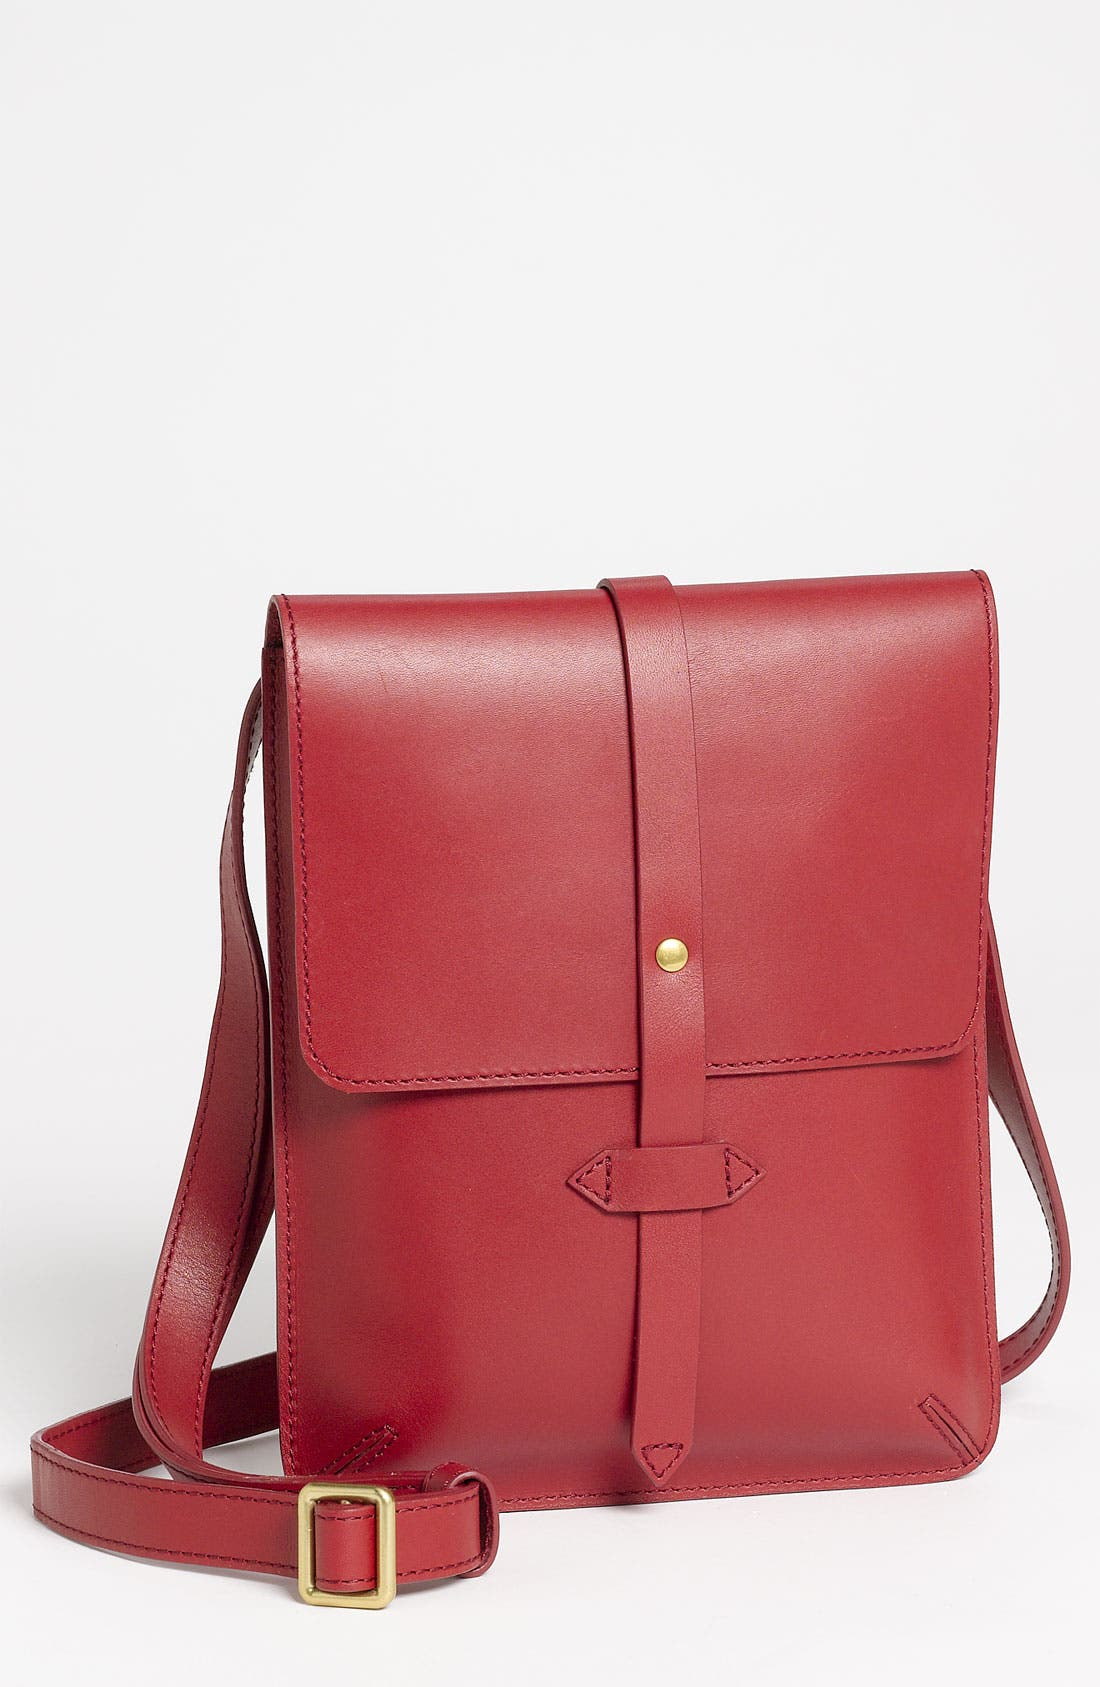 Alternate Image 1 Selected - IIIBeCa By Joy Gryson 'Chambers Street' Crossbody Bag